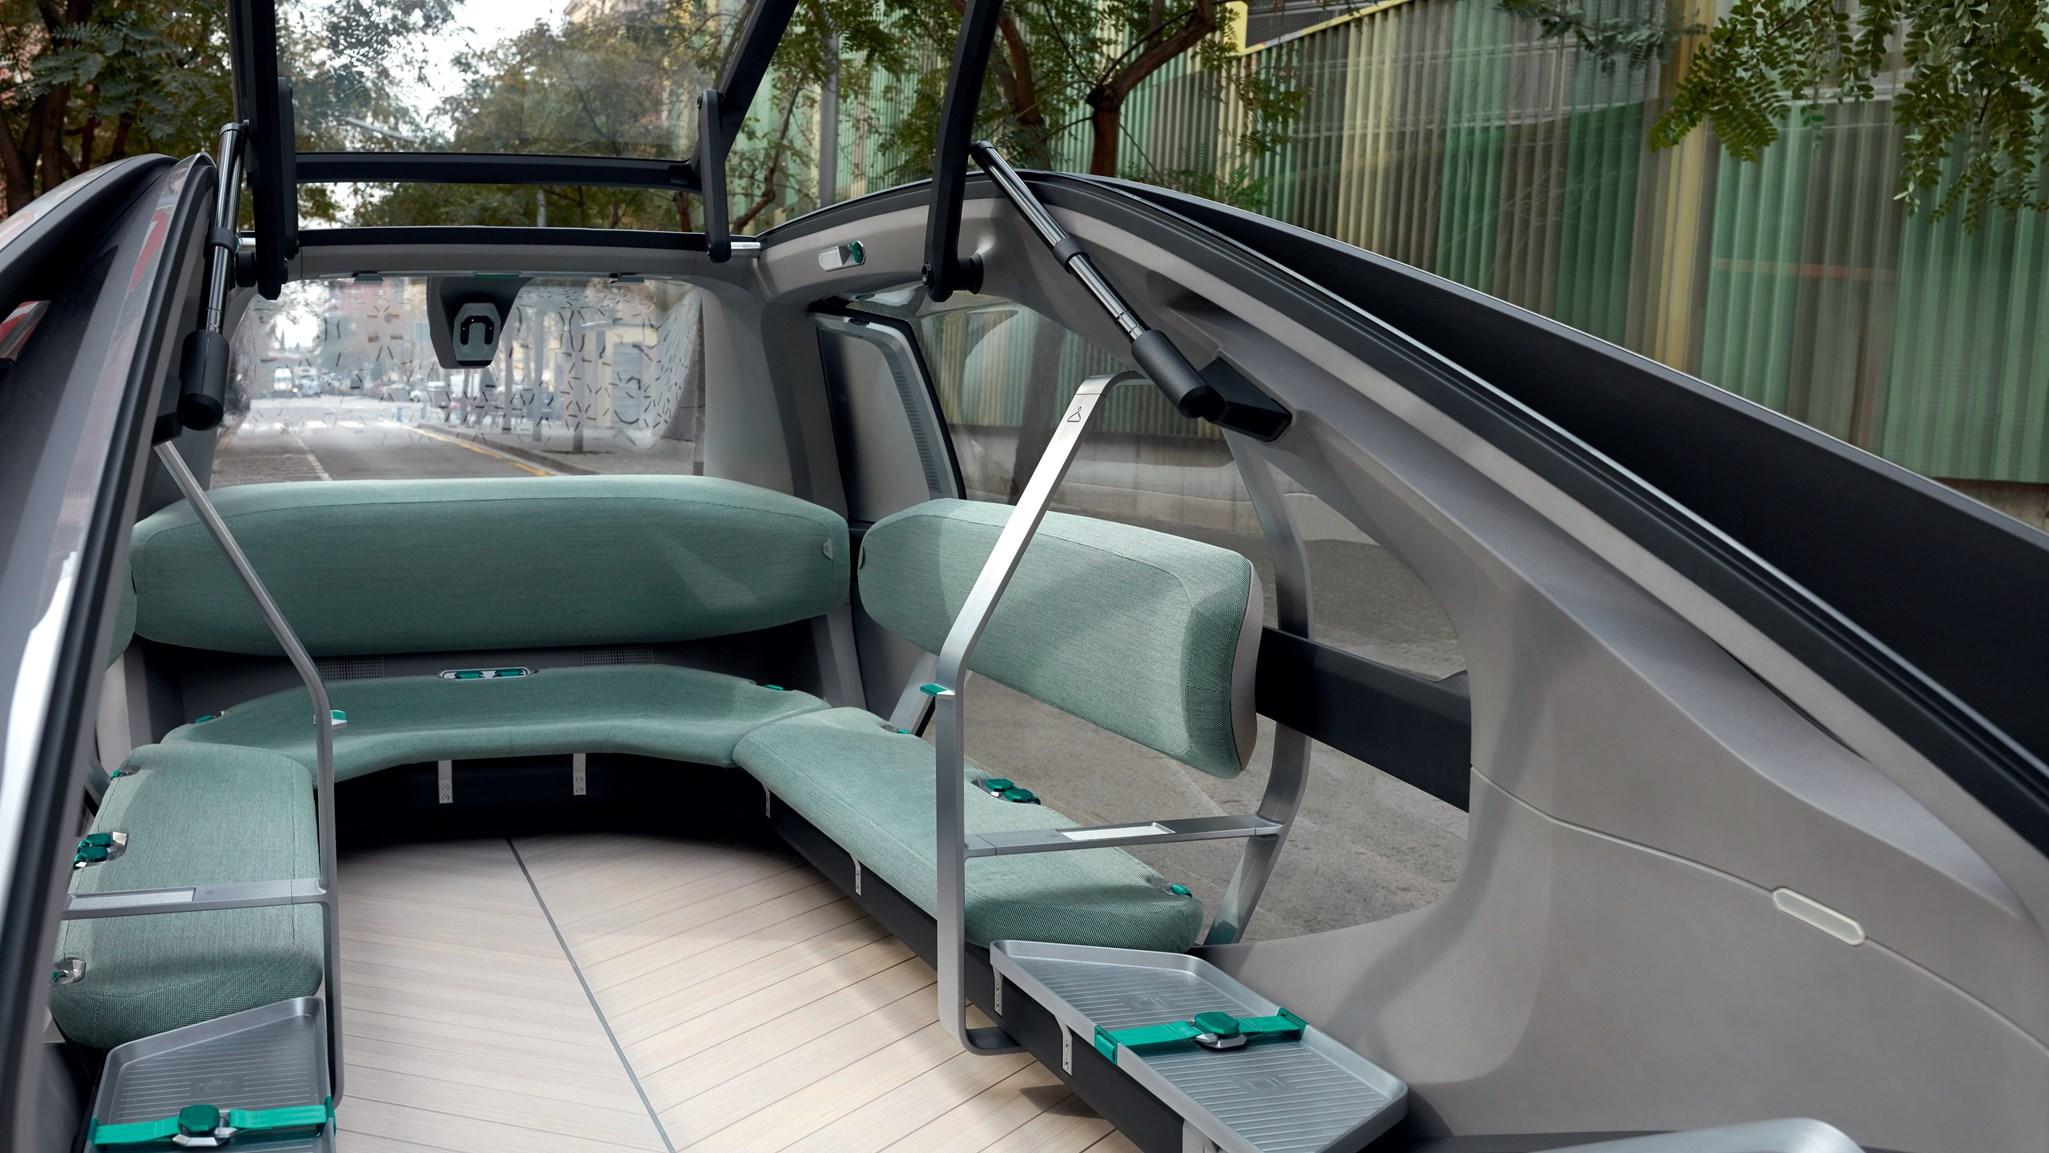 renault ez go concept car news pictures specs geneva motor show car magazine. Black Bedroom Furniture Sets. Home Design Ideas